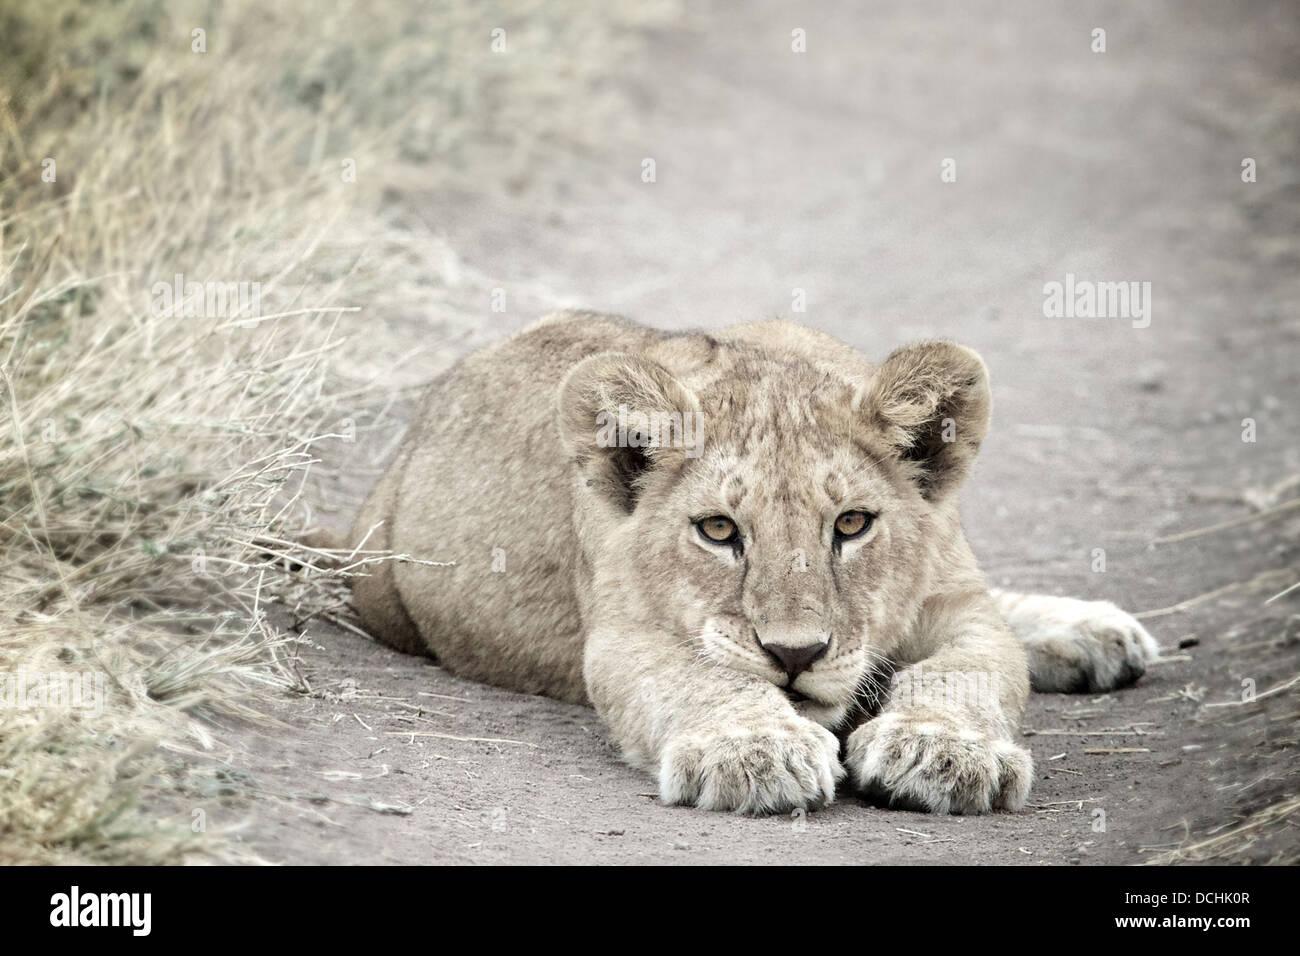 Young lion cub.Panthera leo Serengeti National Park . Tanzania - Stock Image